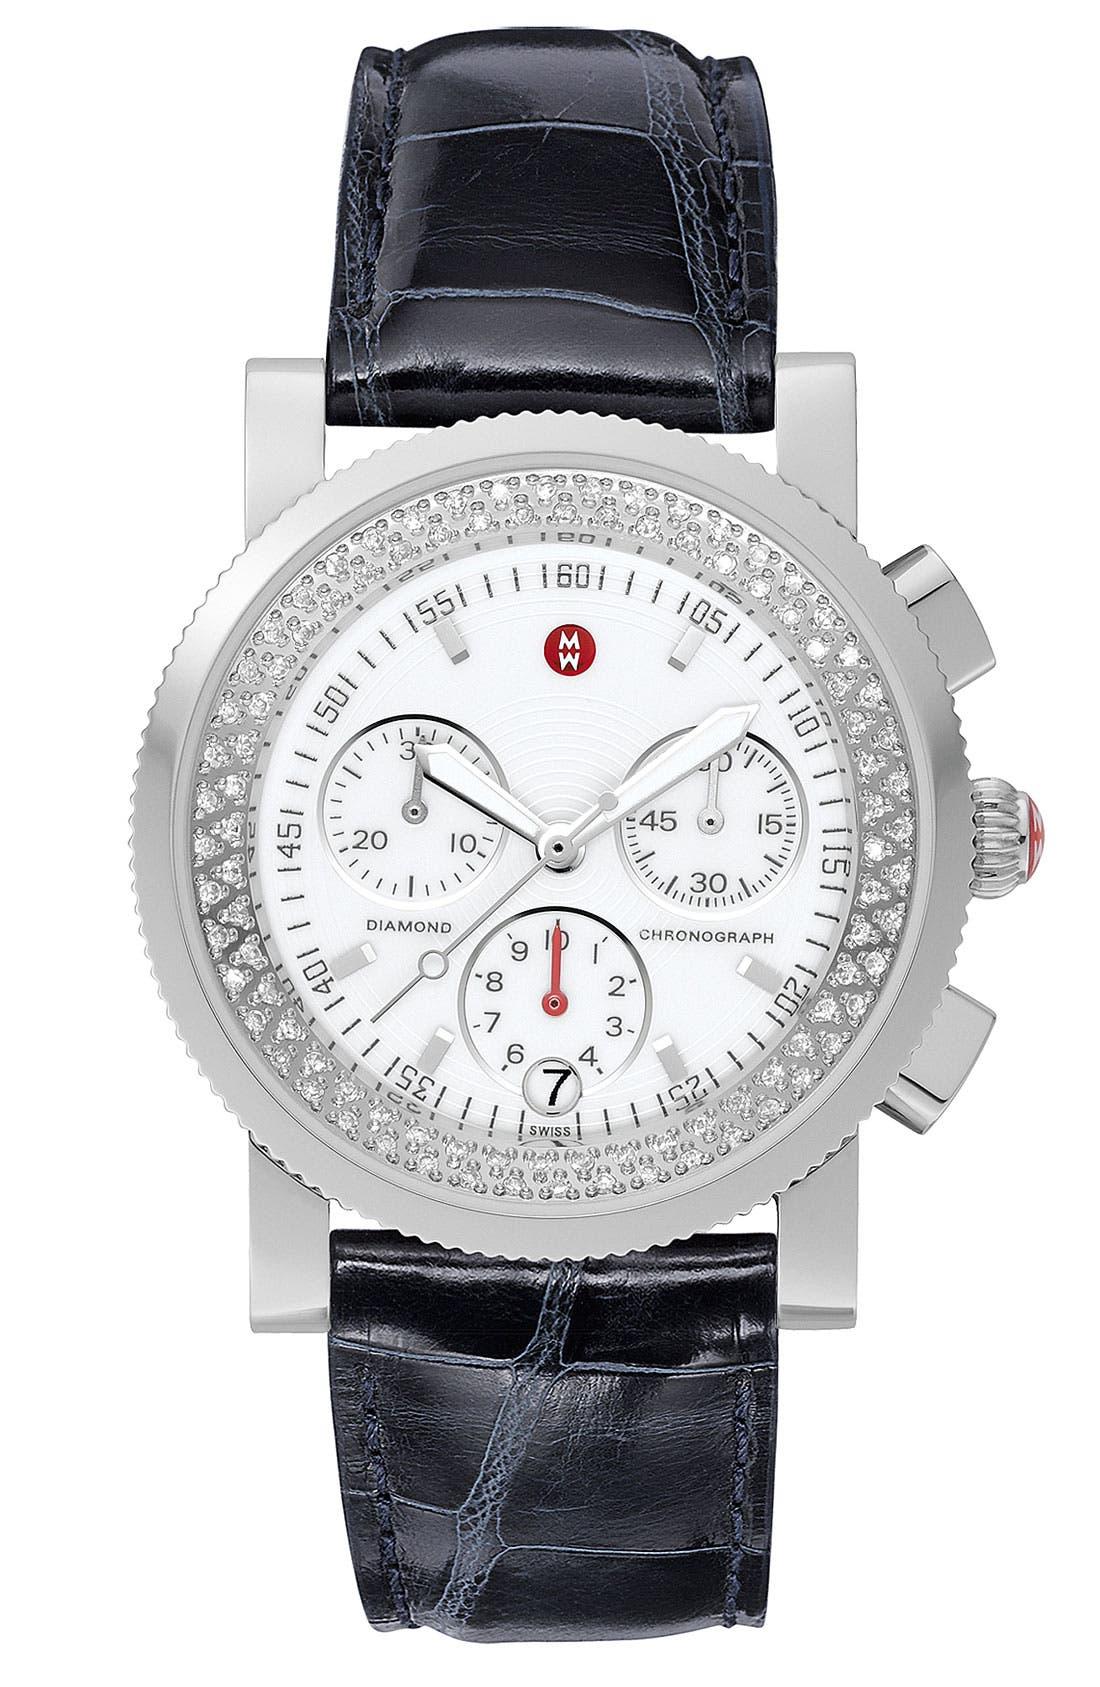 Alternate Image 1 Selected - MICHELE 'Sport Sail' Diamond Watch Case & 20mm Black Alligator Strap